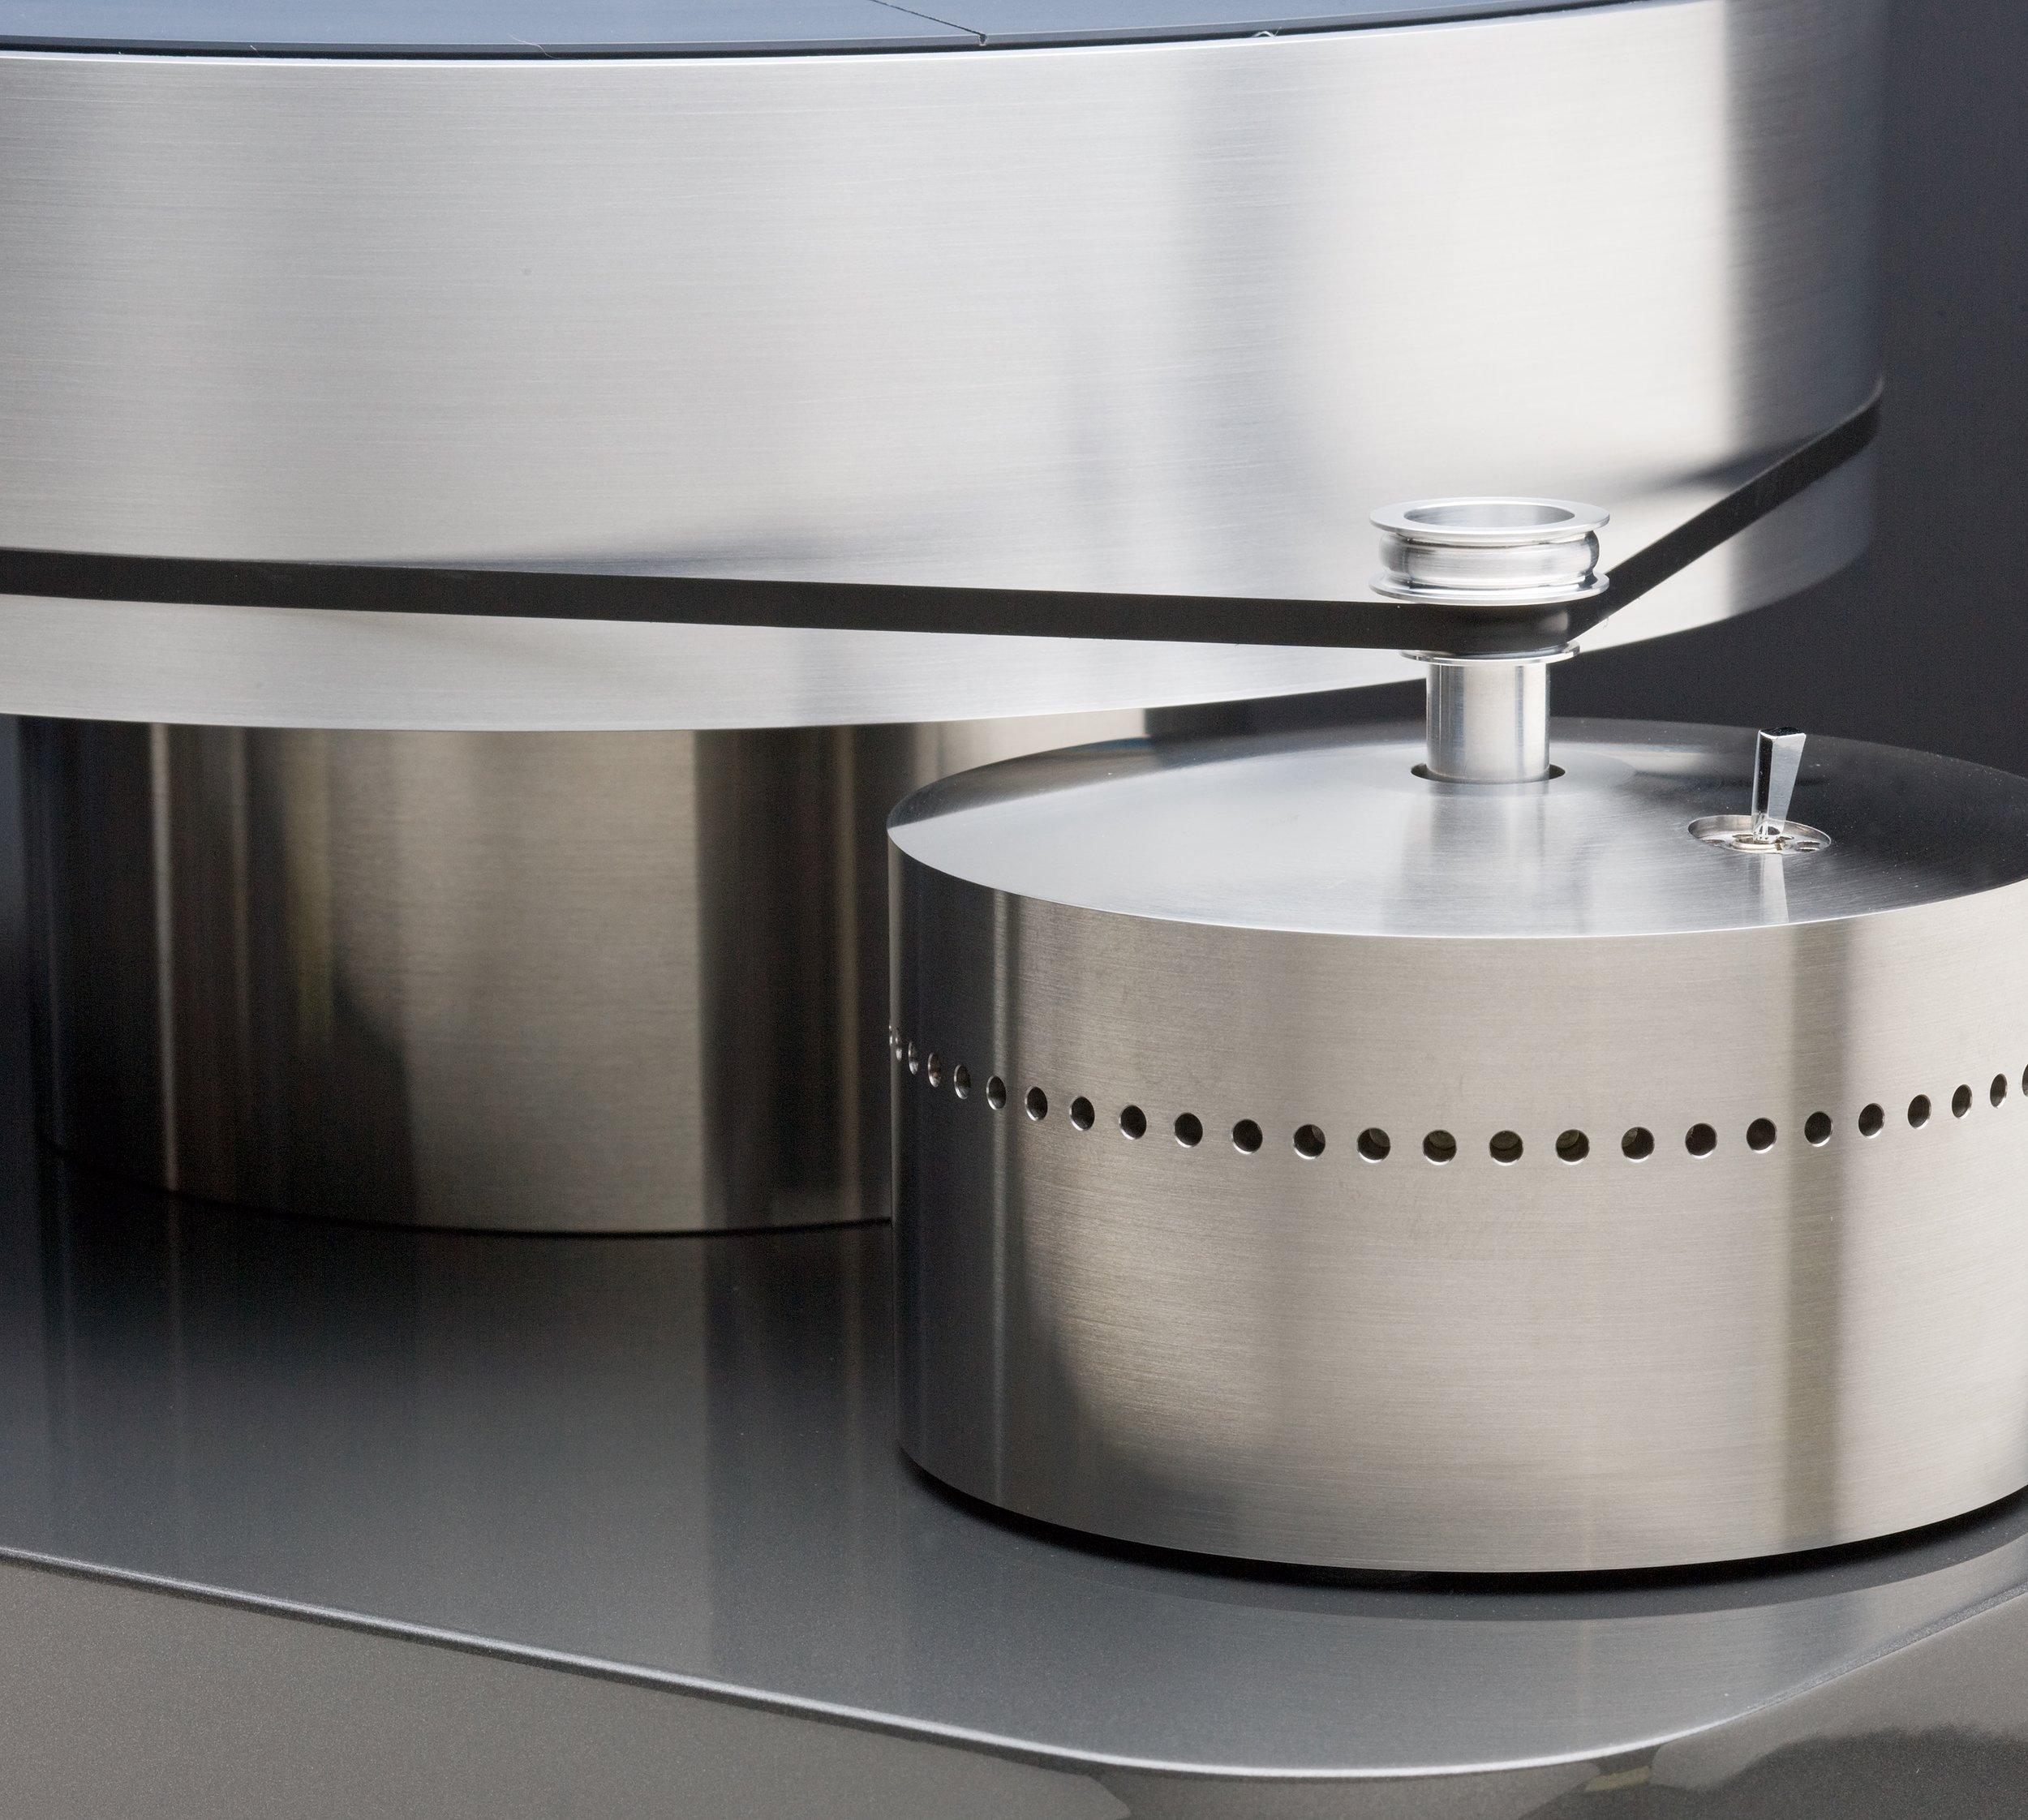 Basis Lab Standard Platter and Motor fin sharp web.jpg